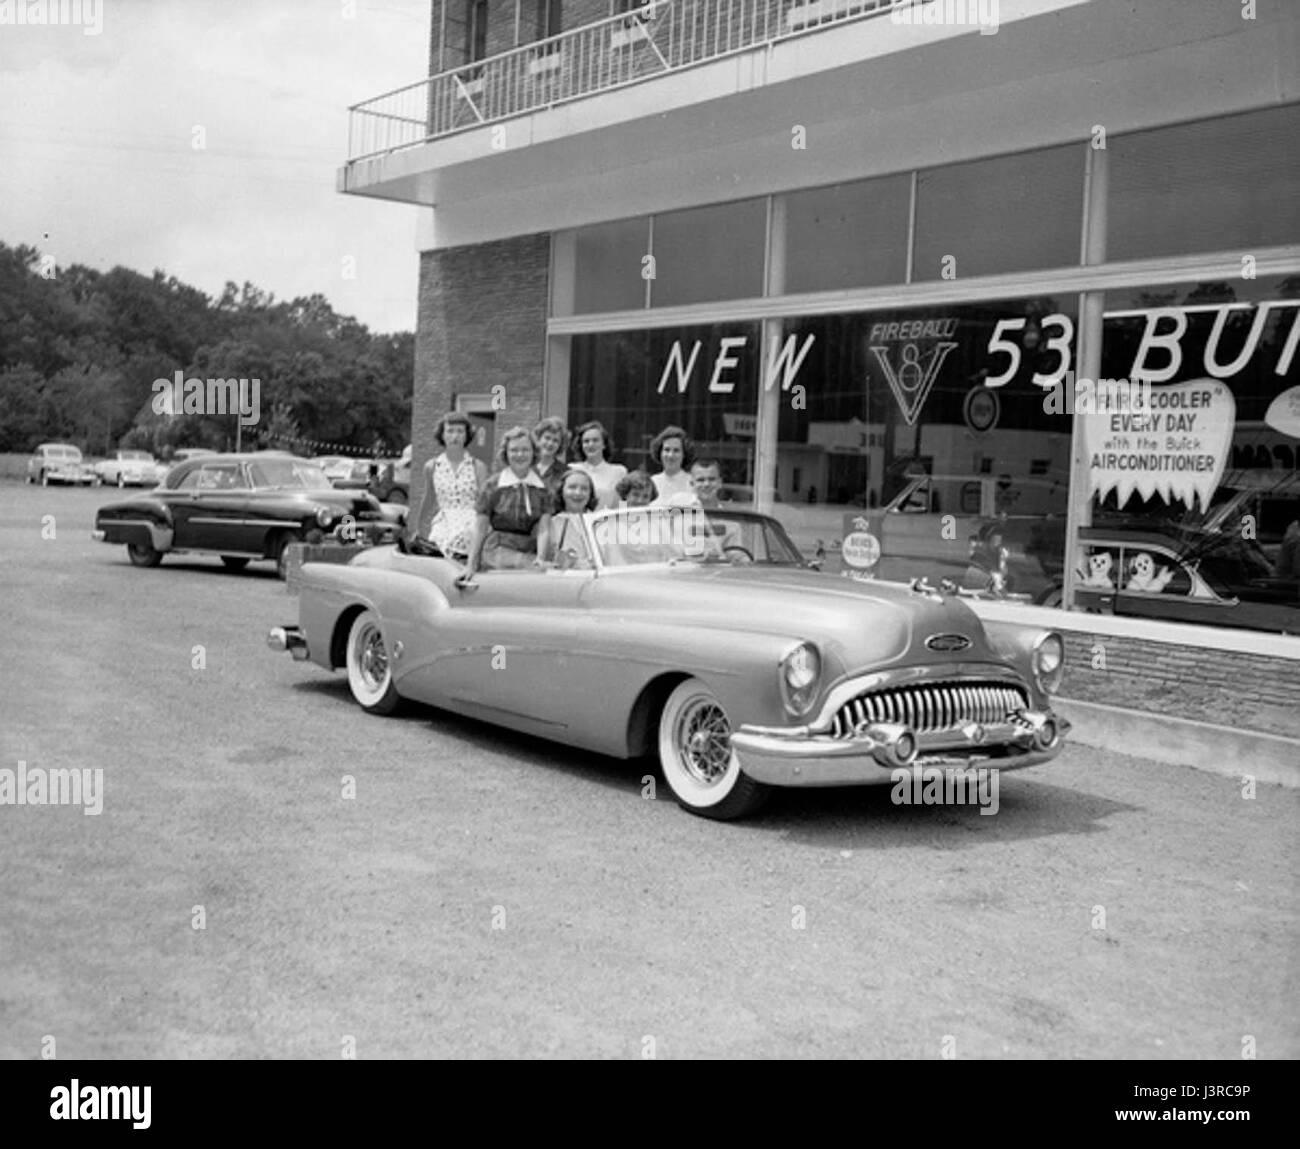 Historic Car Dealership Stock Photos & Historic Car